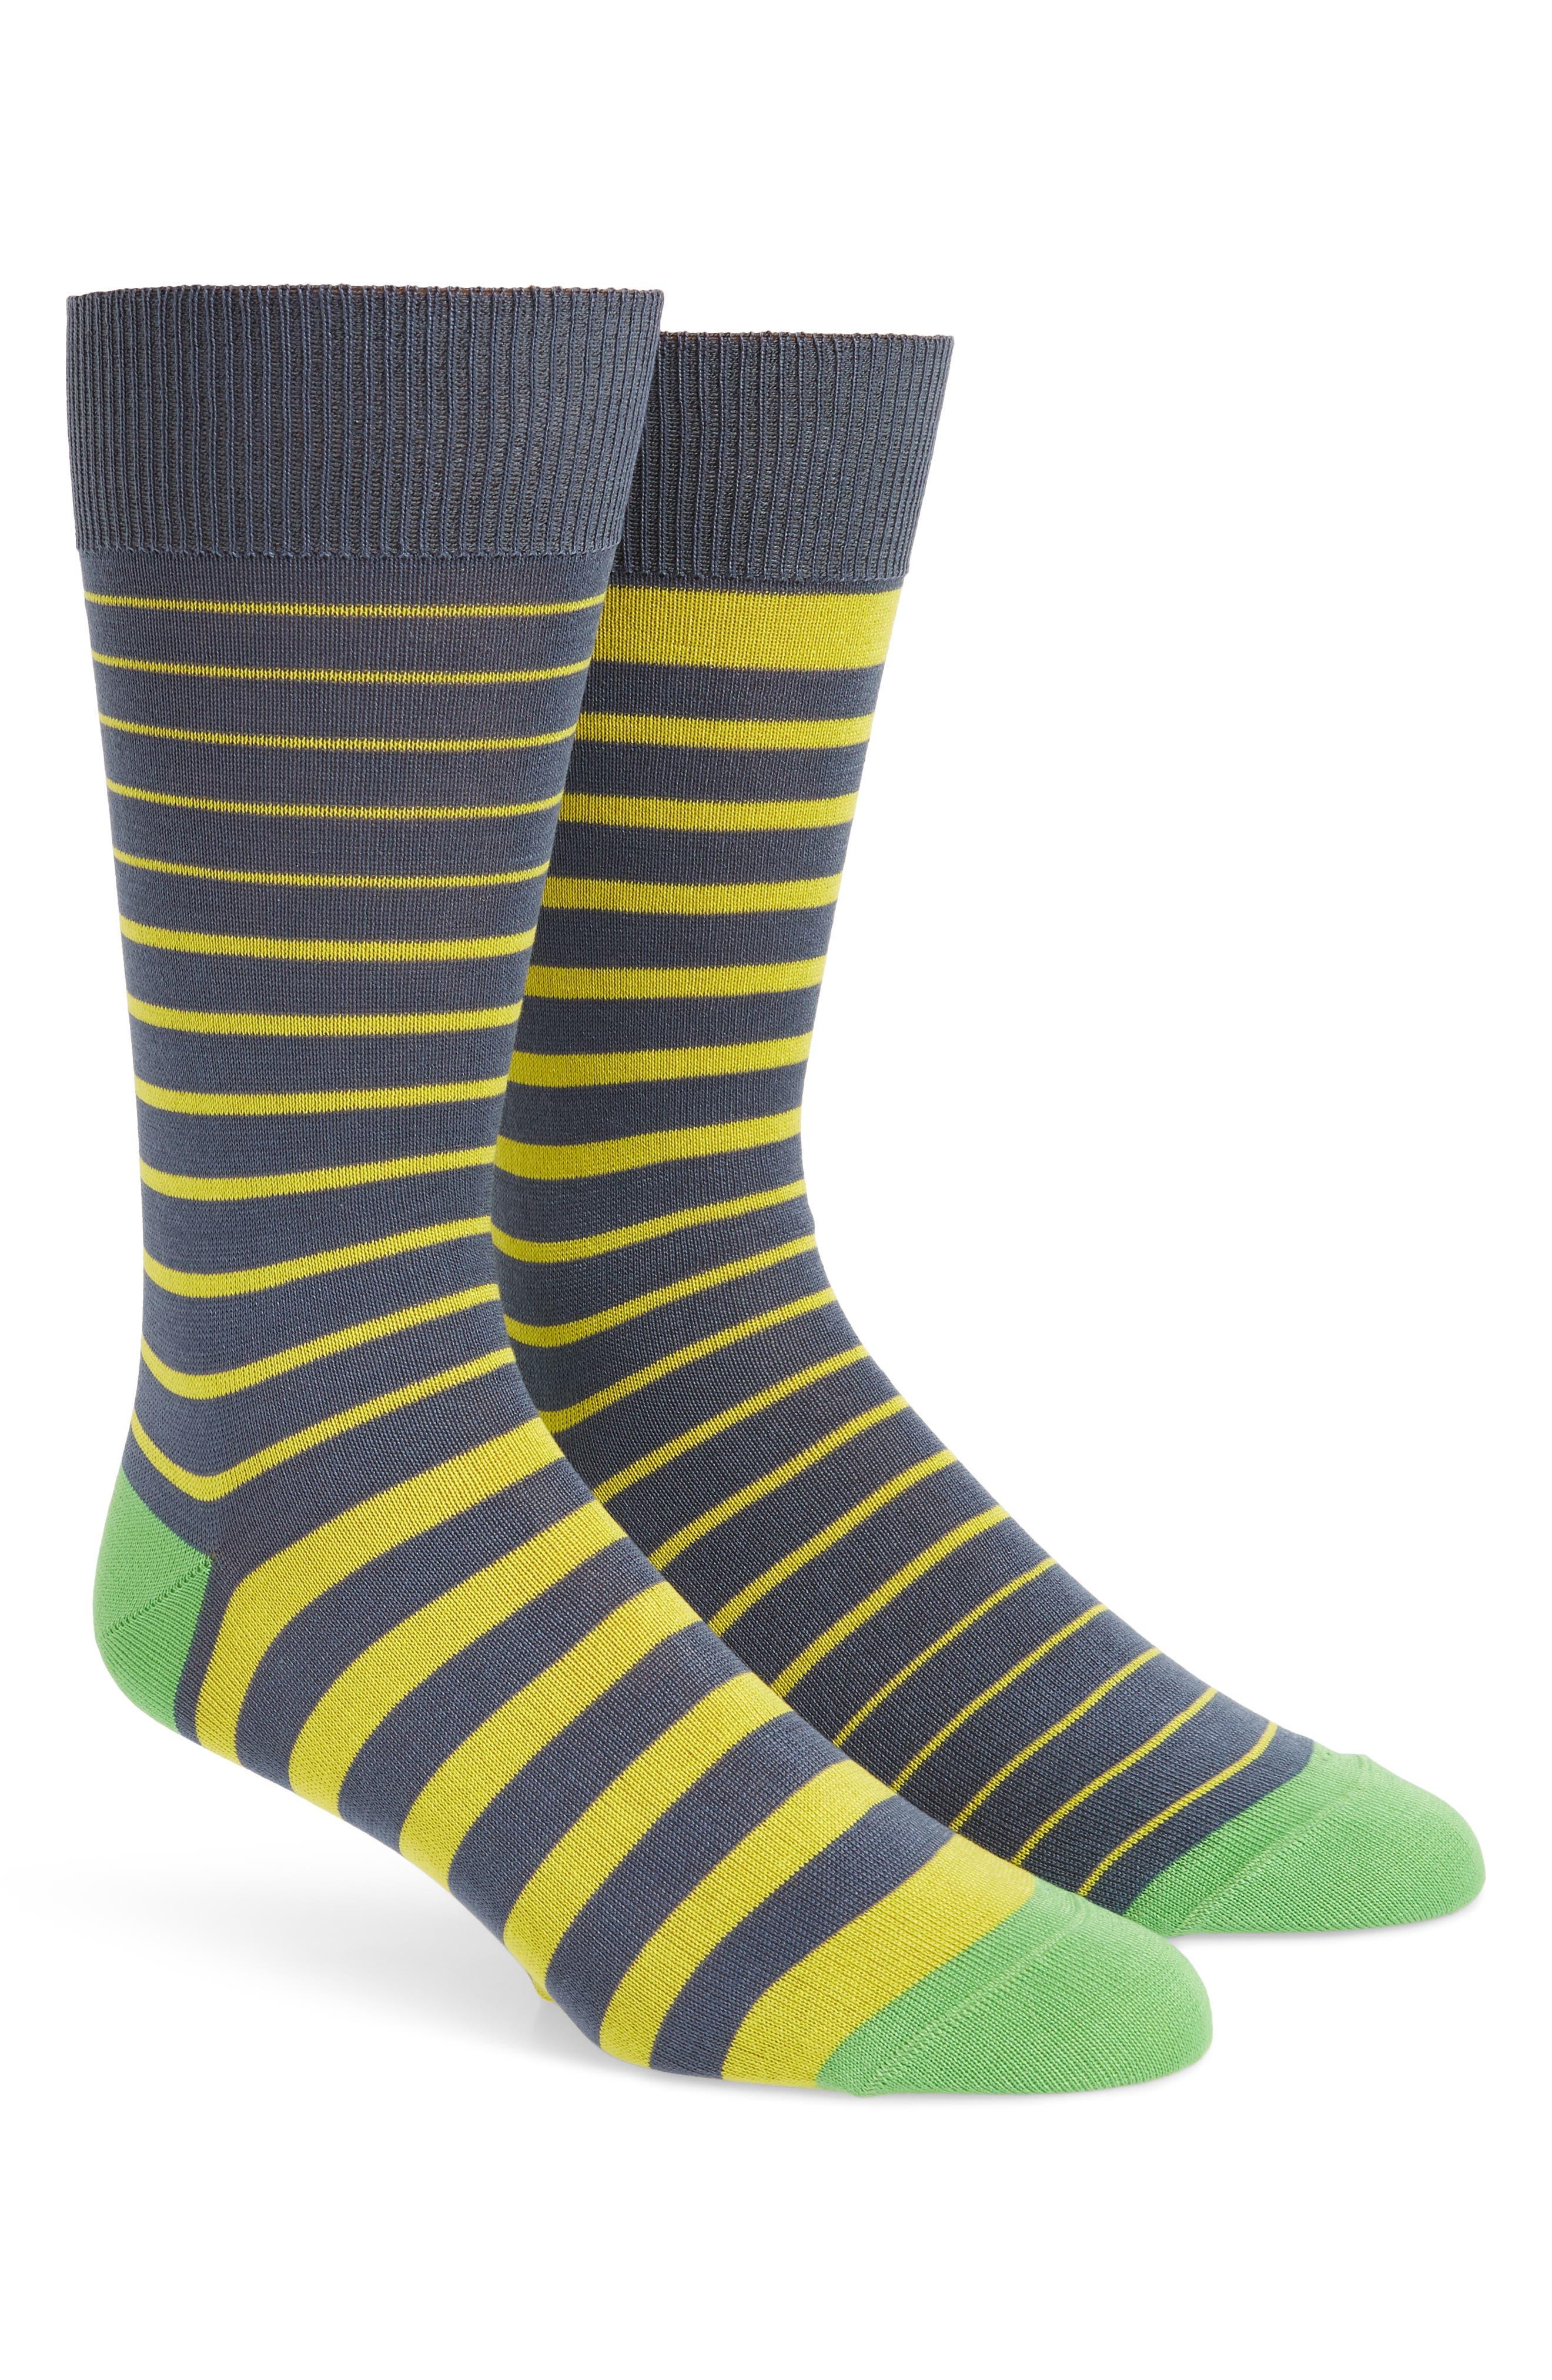 Cube Odd Striped Socks,                             Main thumbnail 1, color,                             GREY